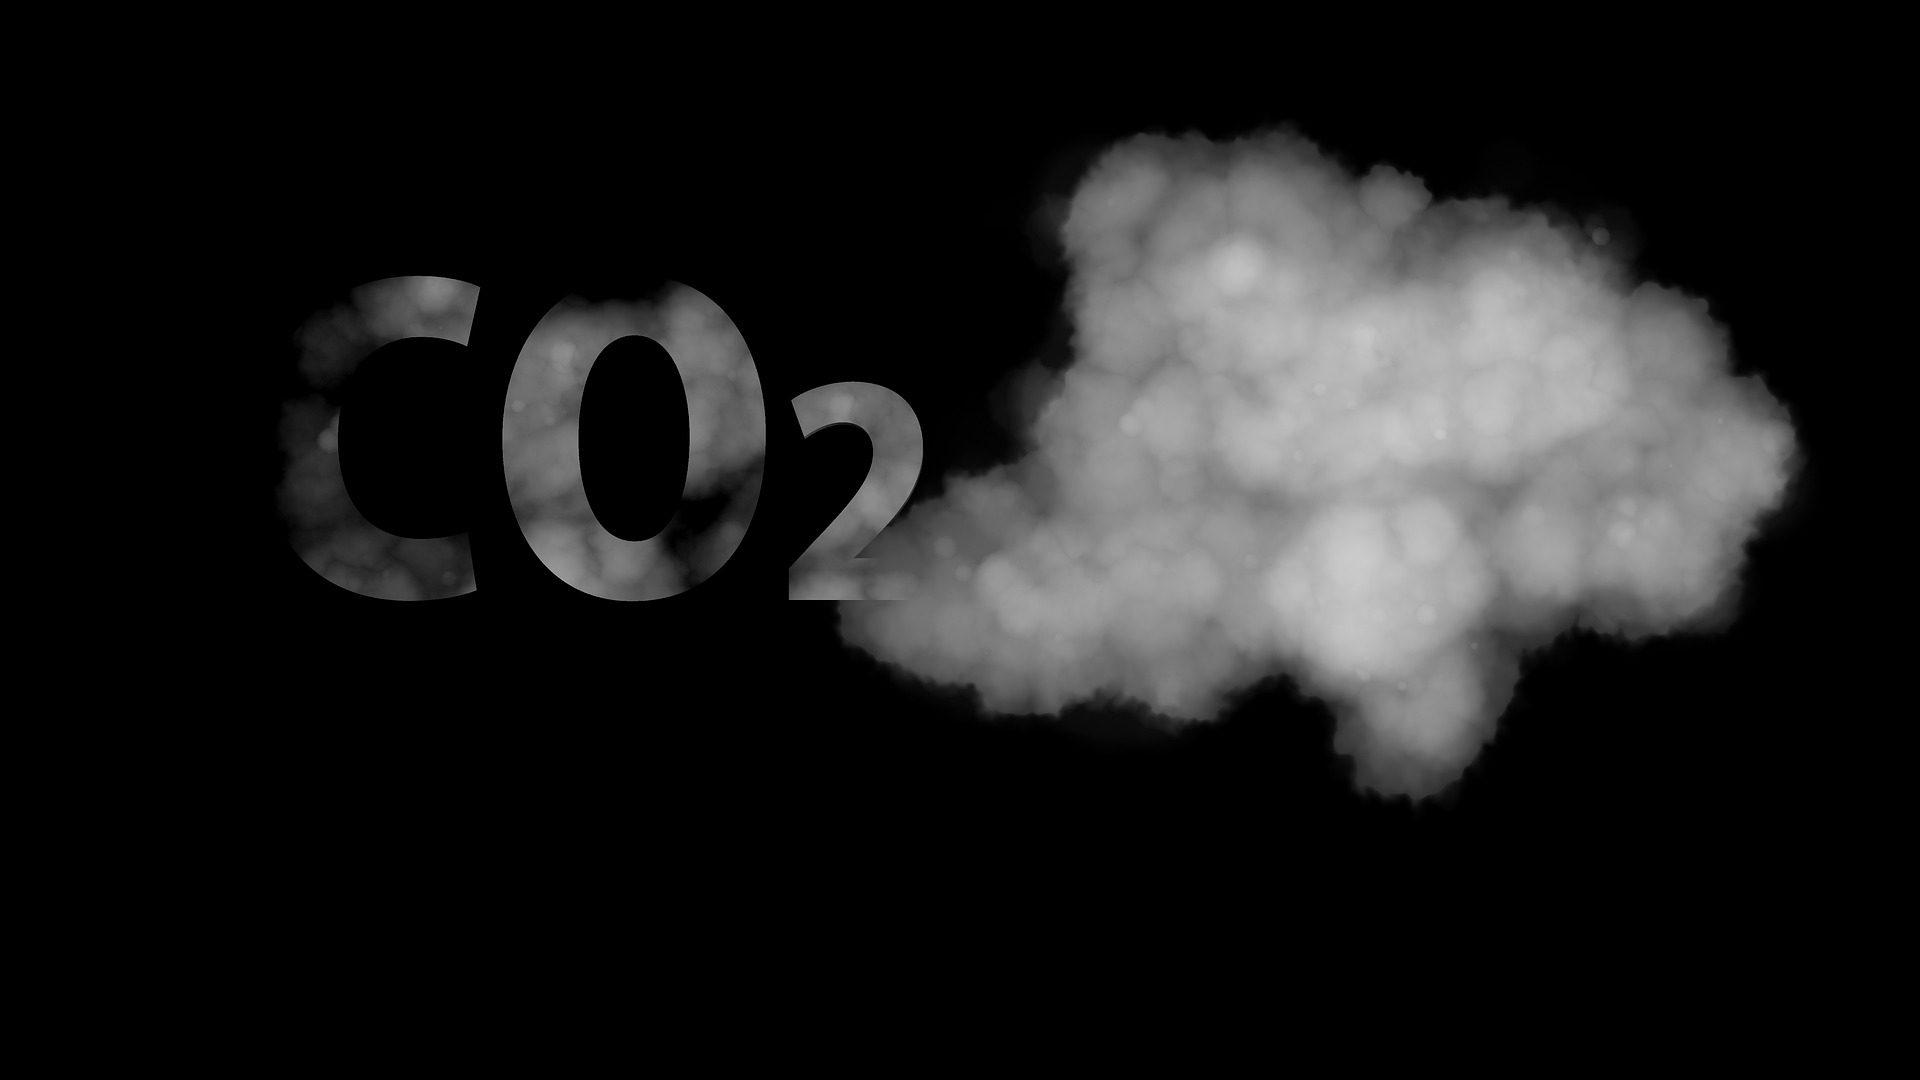 Carbon dioxide shielding gas